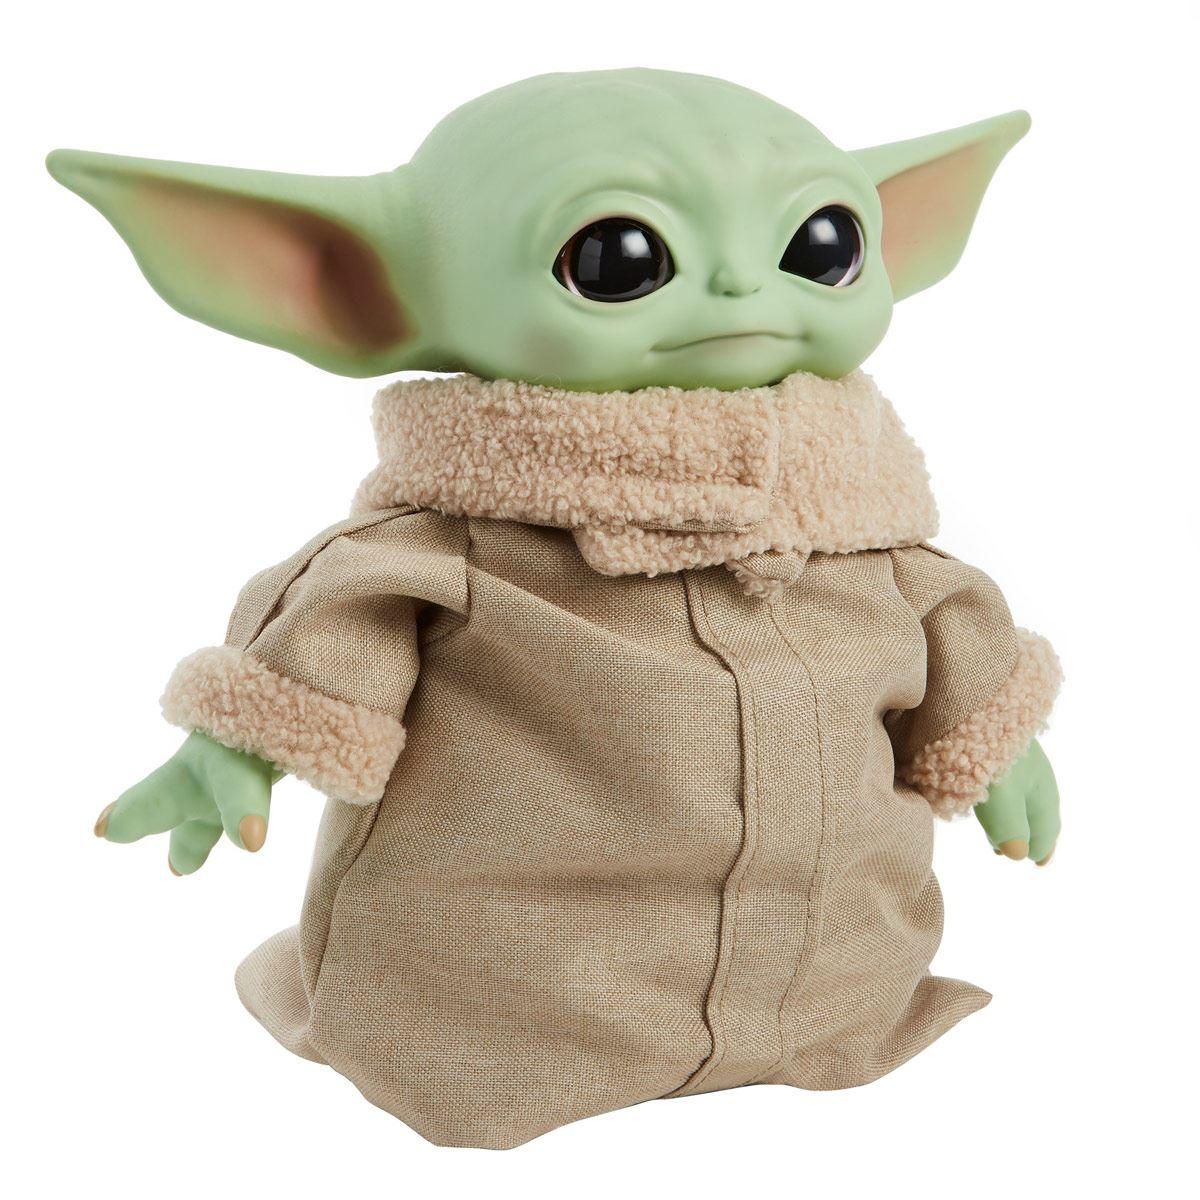 Mattel Star Wars The Mandalorian The Child 11